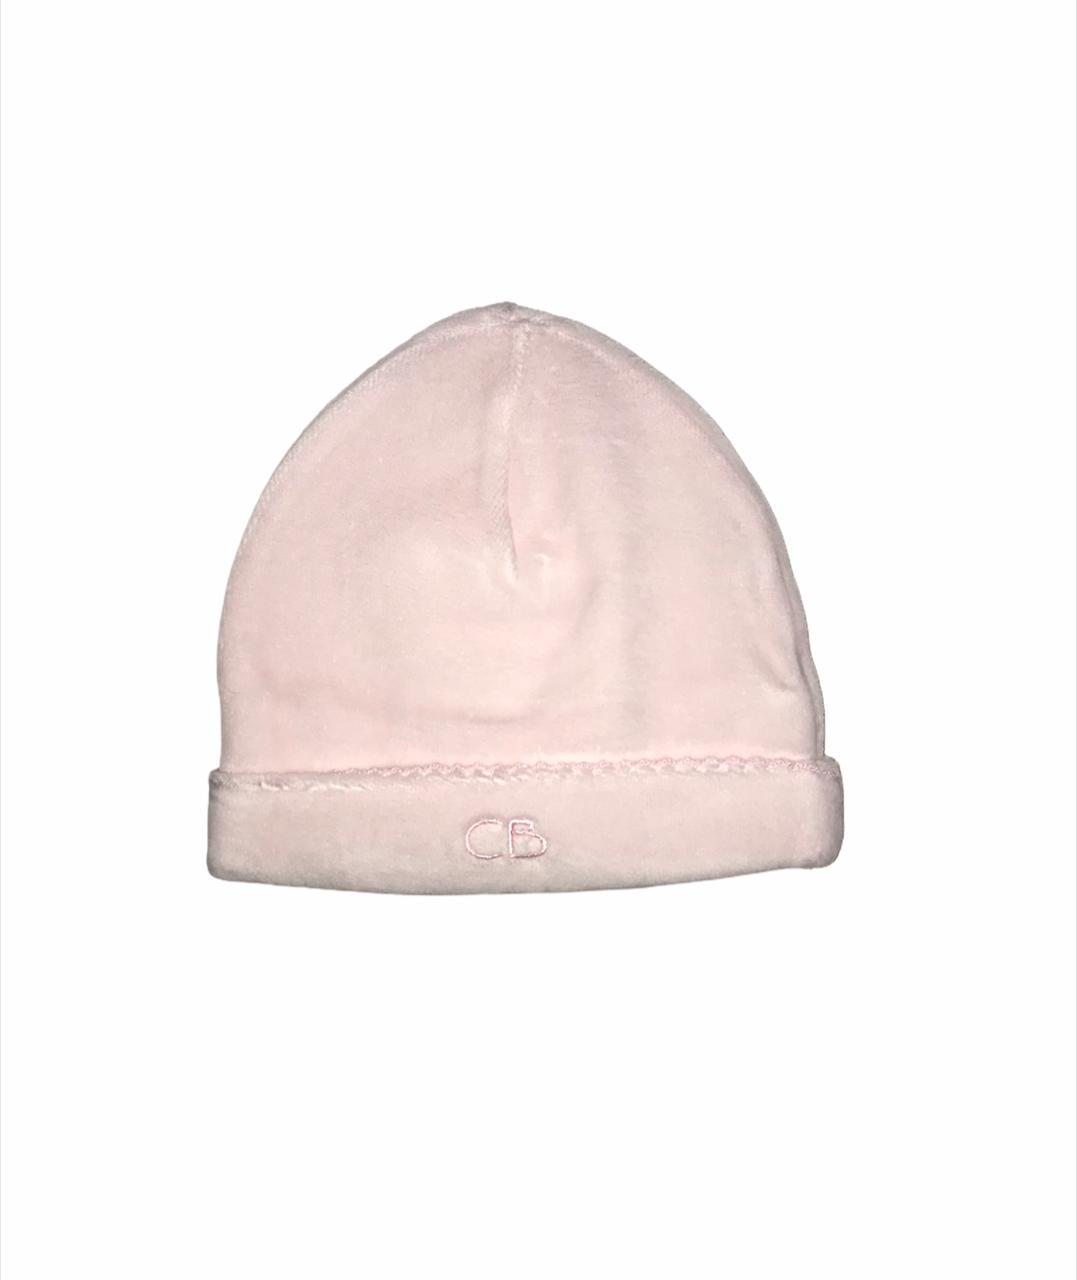 Gorro basico plush rosa